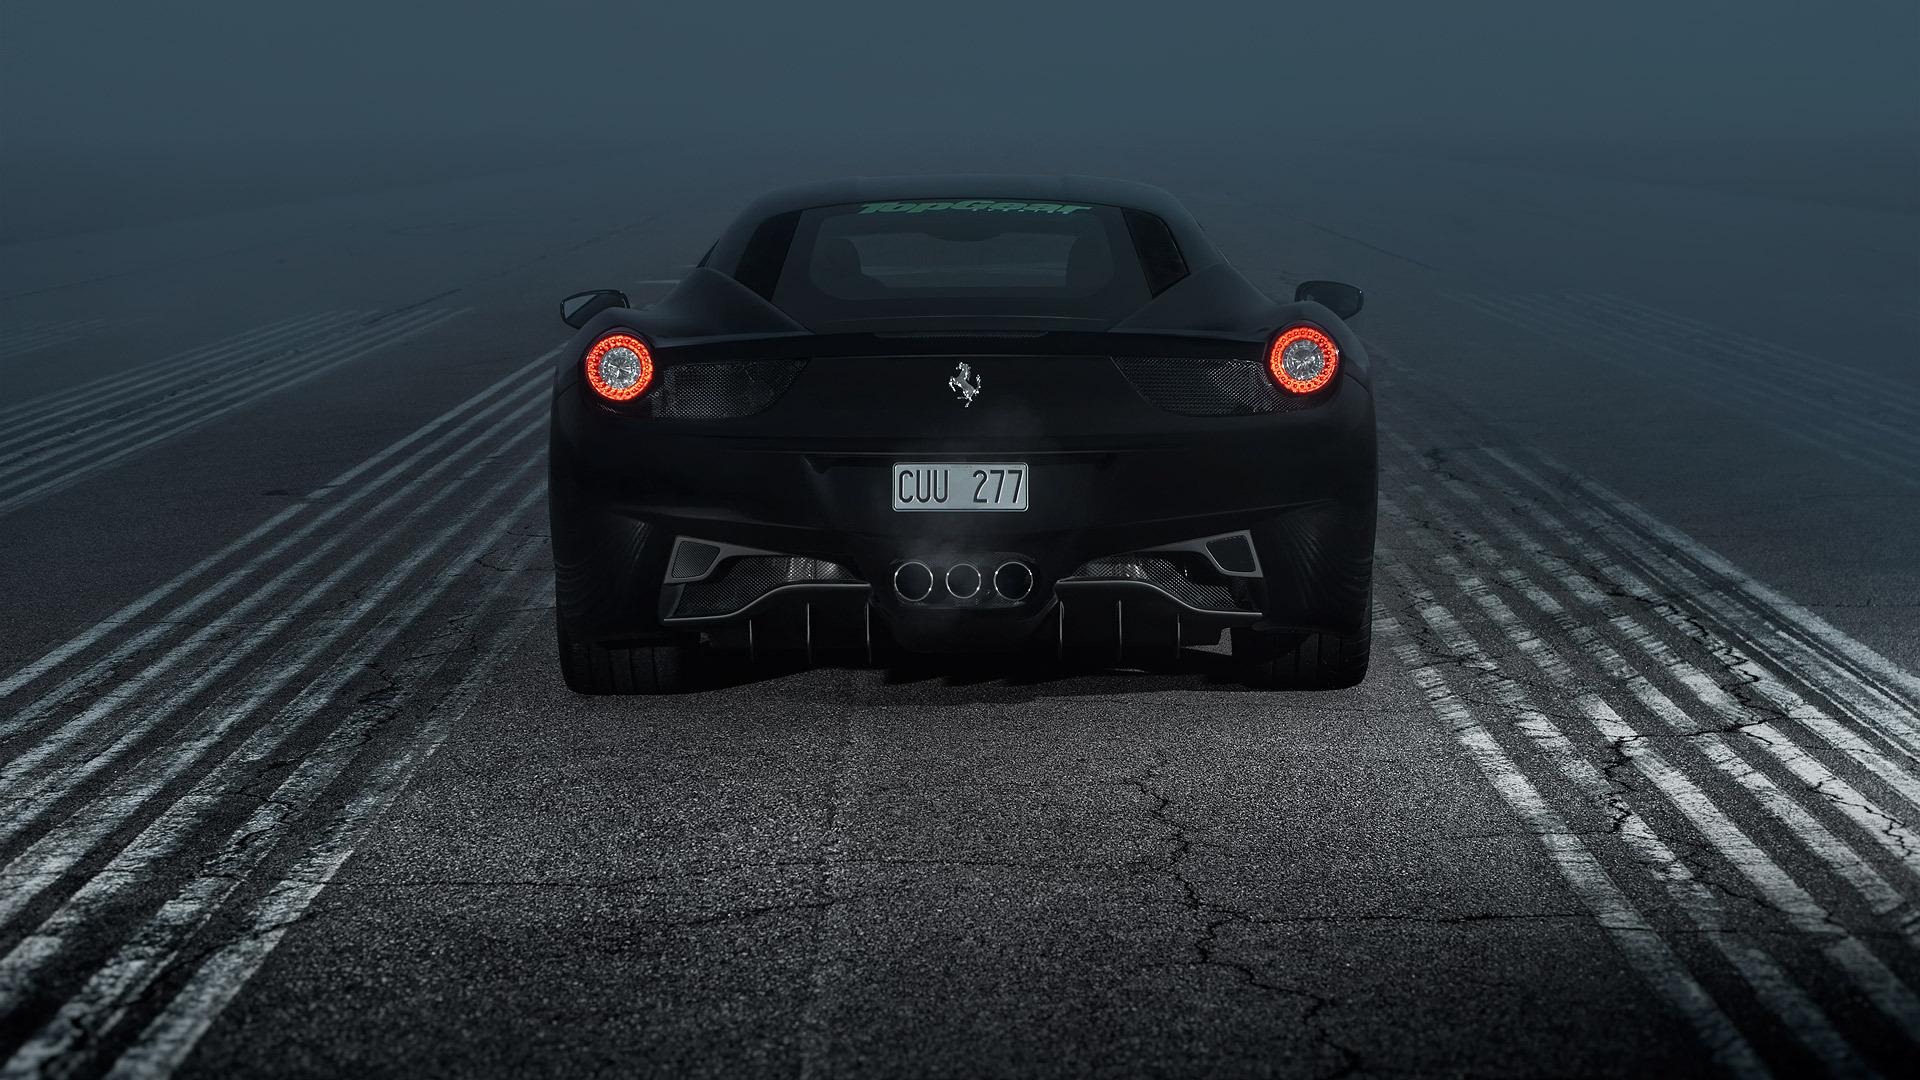 Back To 51 Black Ferrari Wallpapers Hd Black Matte Ferrari Hd 2100399 Hd Wallpaper Backgrounds Download